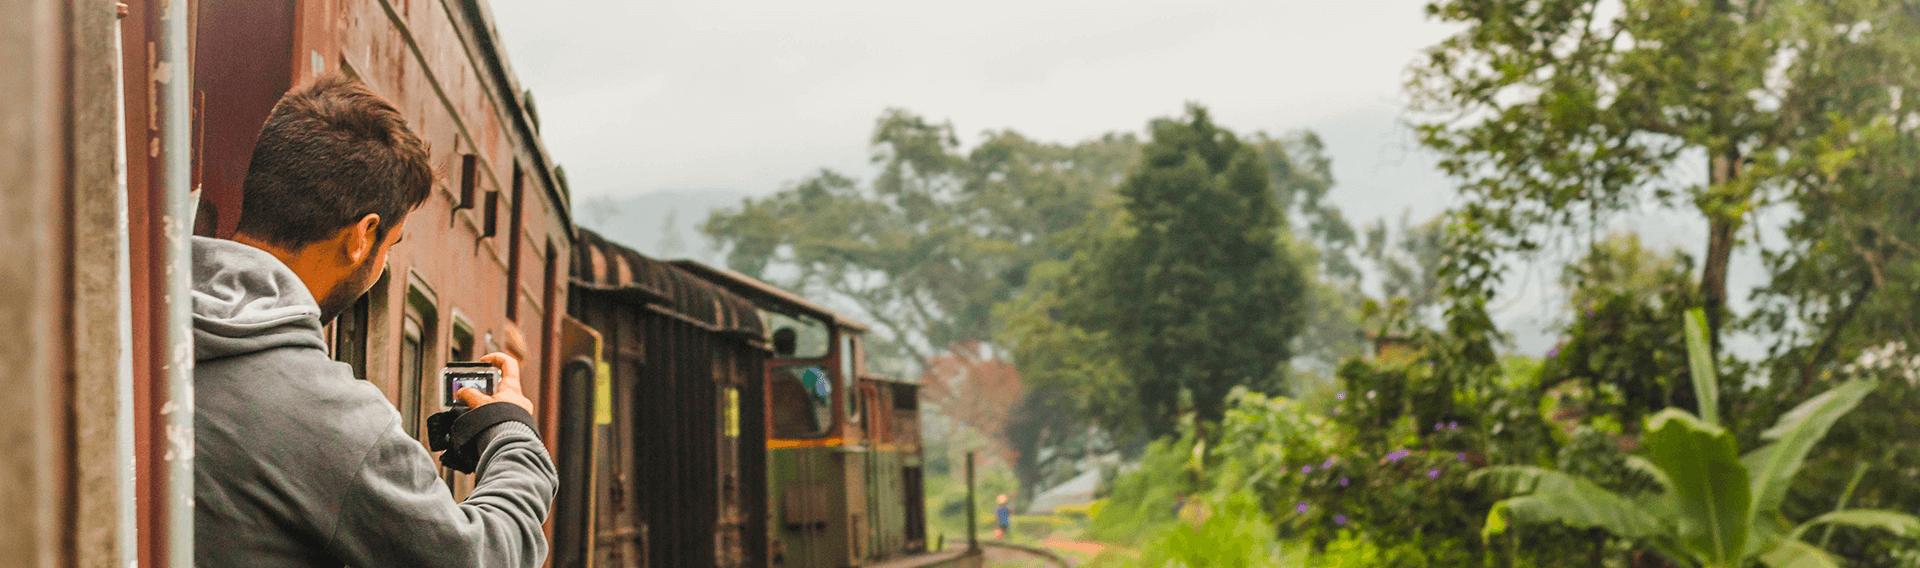 Voyage en train, Kandy-Ella, Sri Lanka